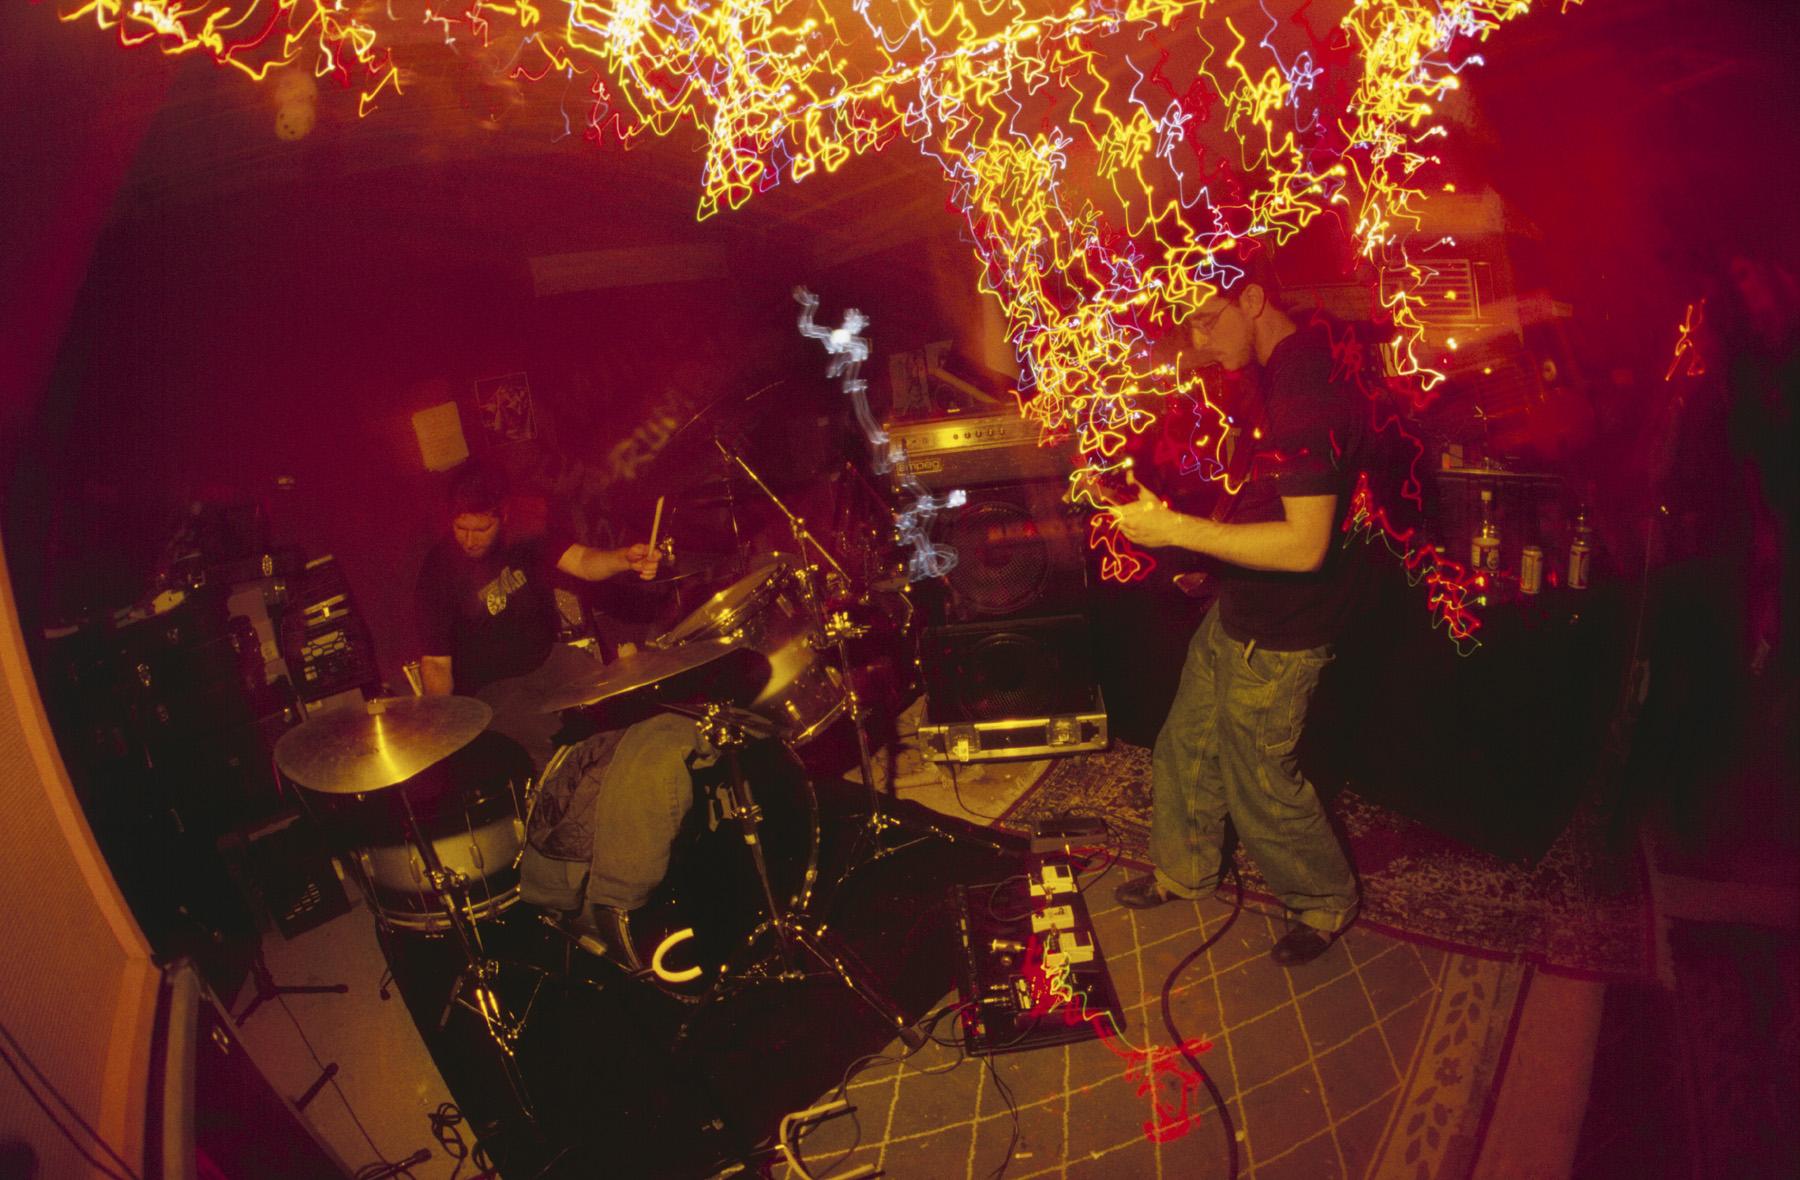 5ive (photo by Jason Hellmann)